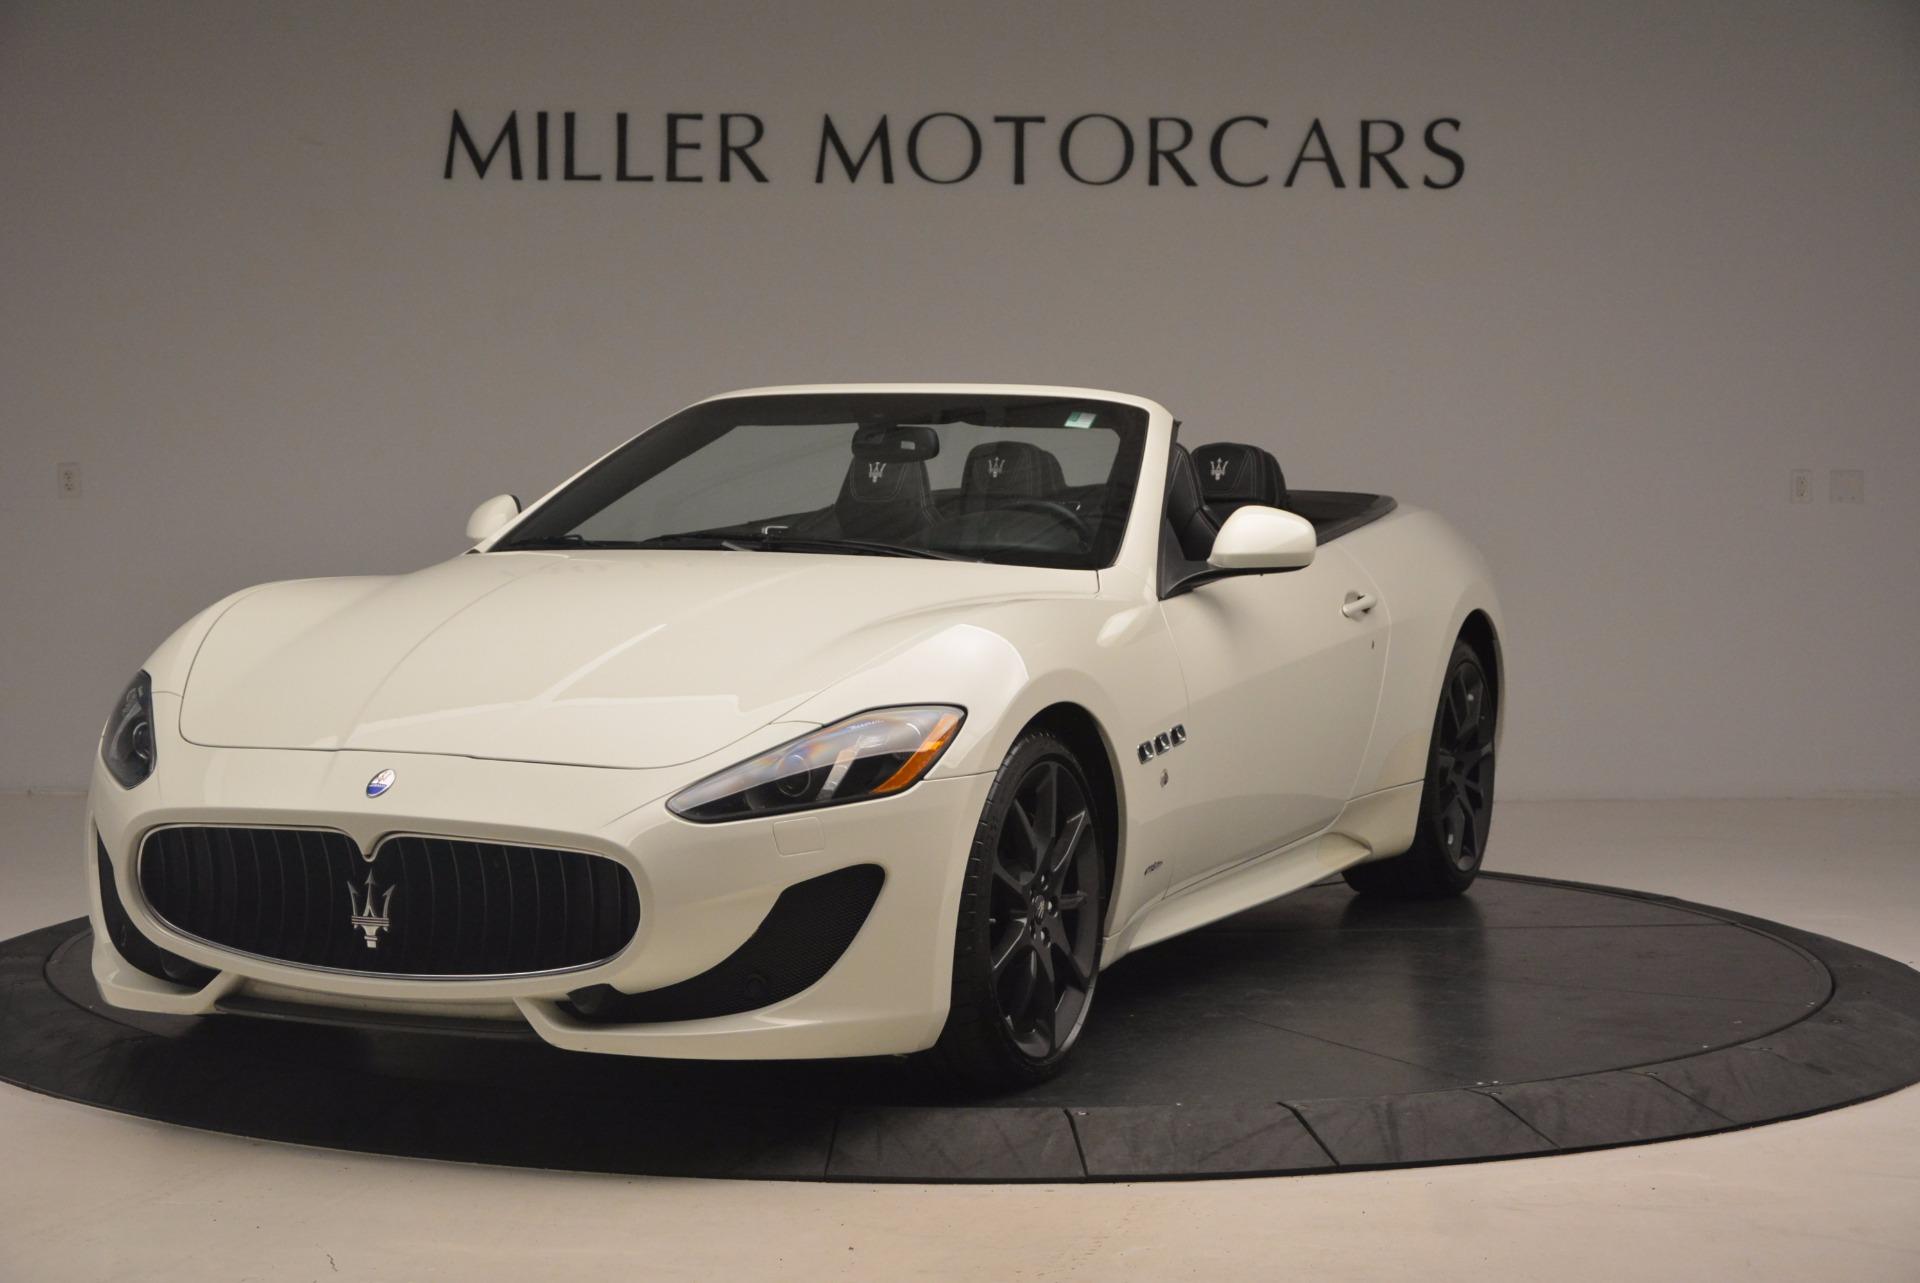 Used 2014 Maserati GranTurismo Sport for sale Sold at Pagani of Greenwich in Greenwich CT 06830 1